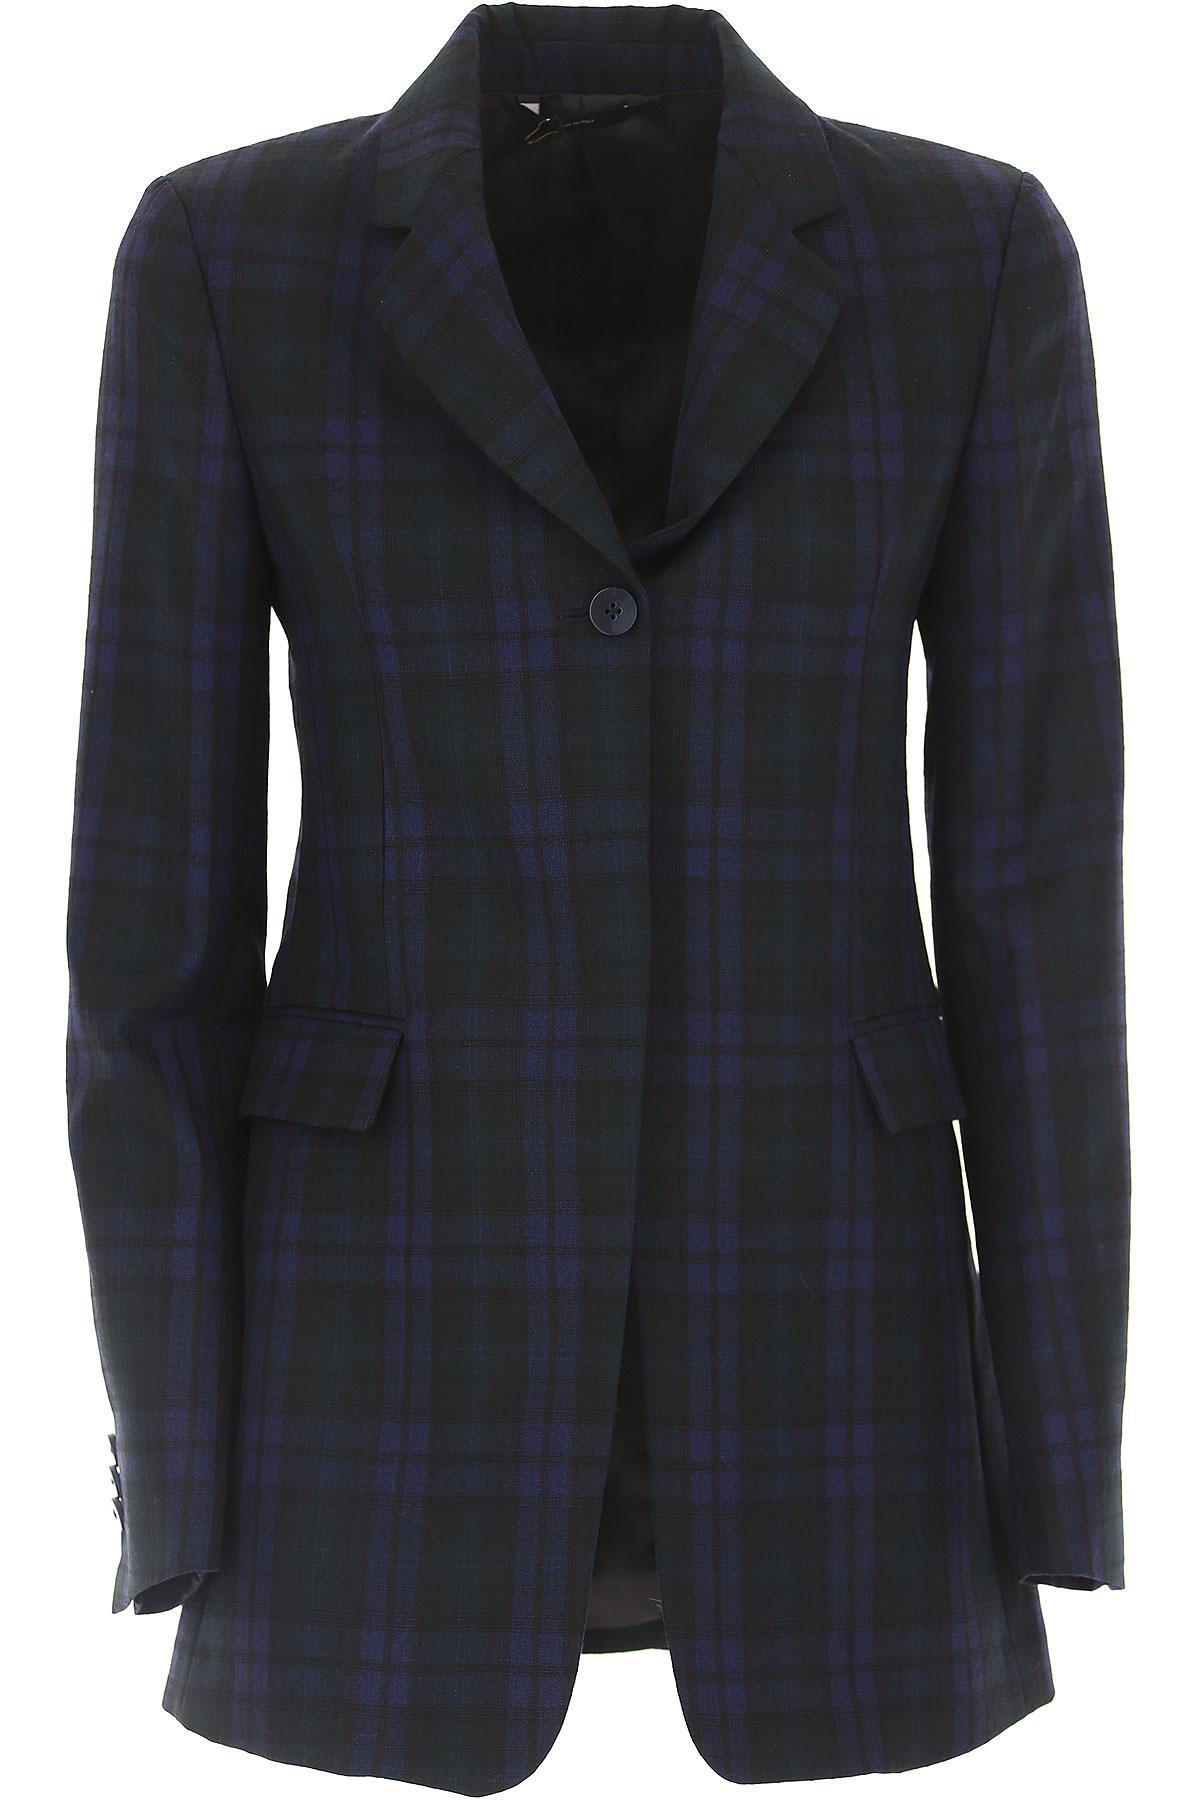 Paul Smith Clothing